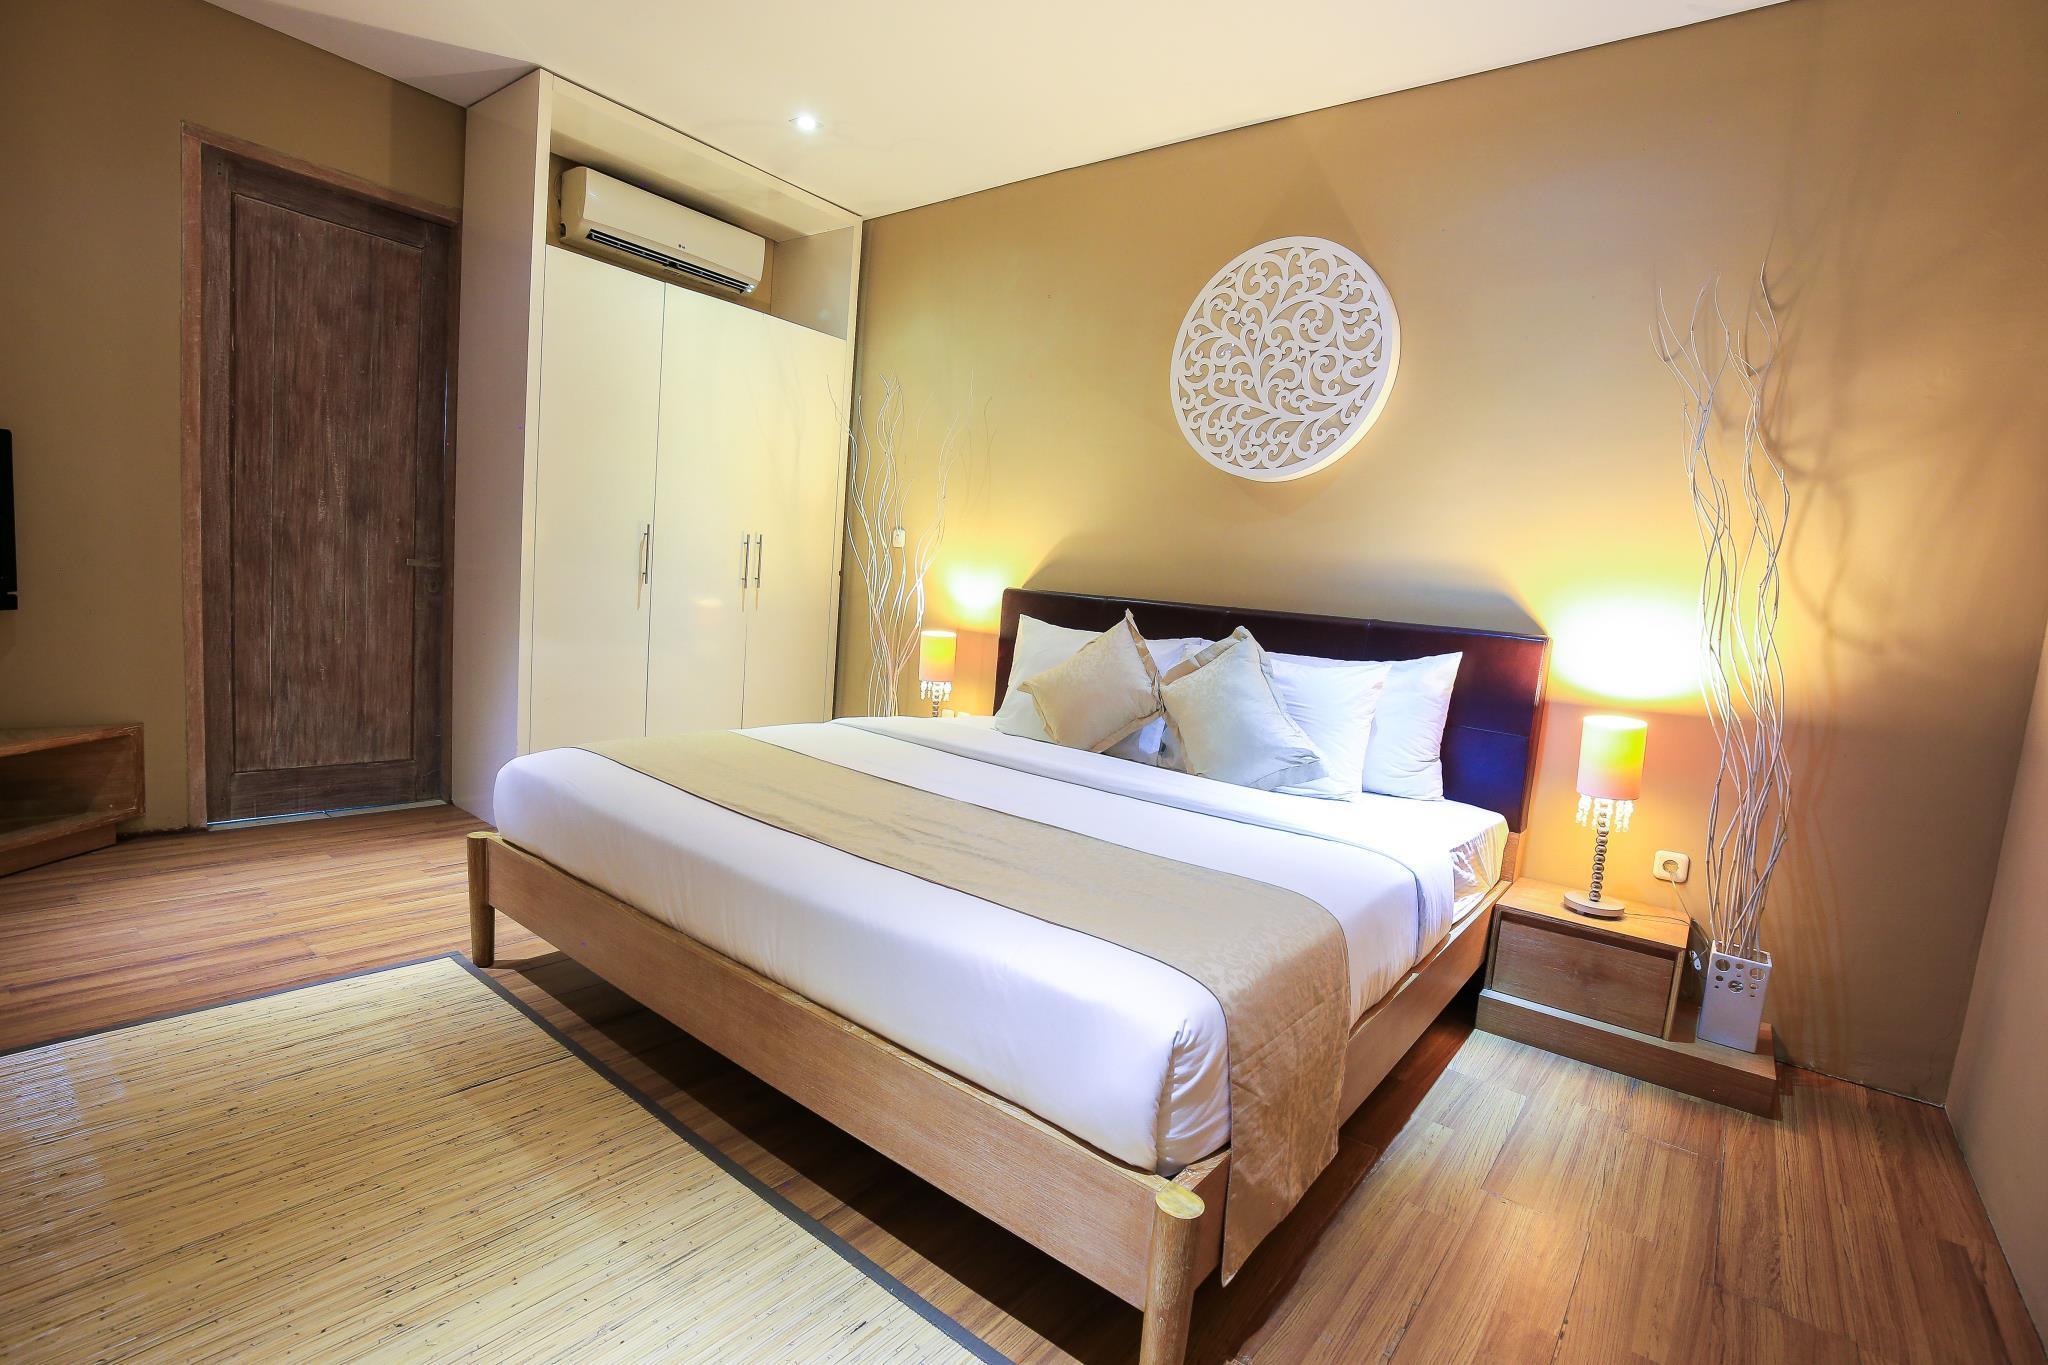 Hotel ***Luxury Villa - Central Petitenget, Seminyak*** - Gang Orchid, Jalan Petitenget - Bali